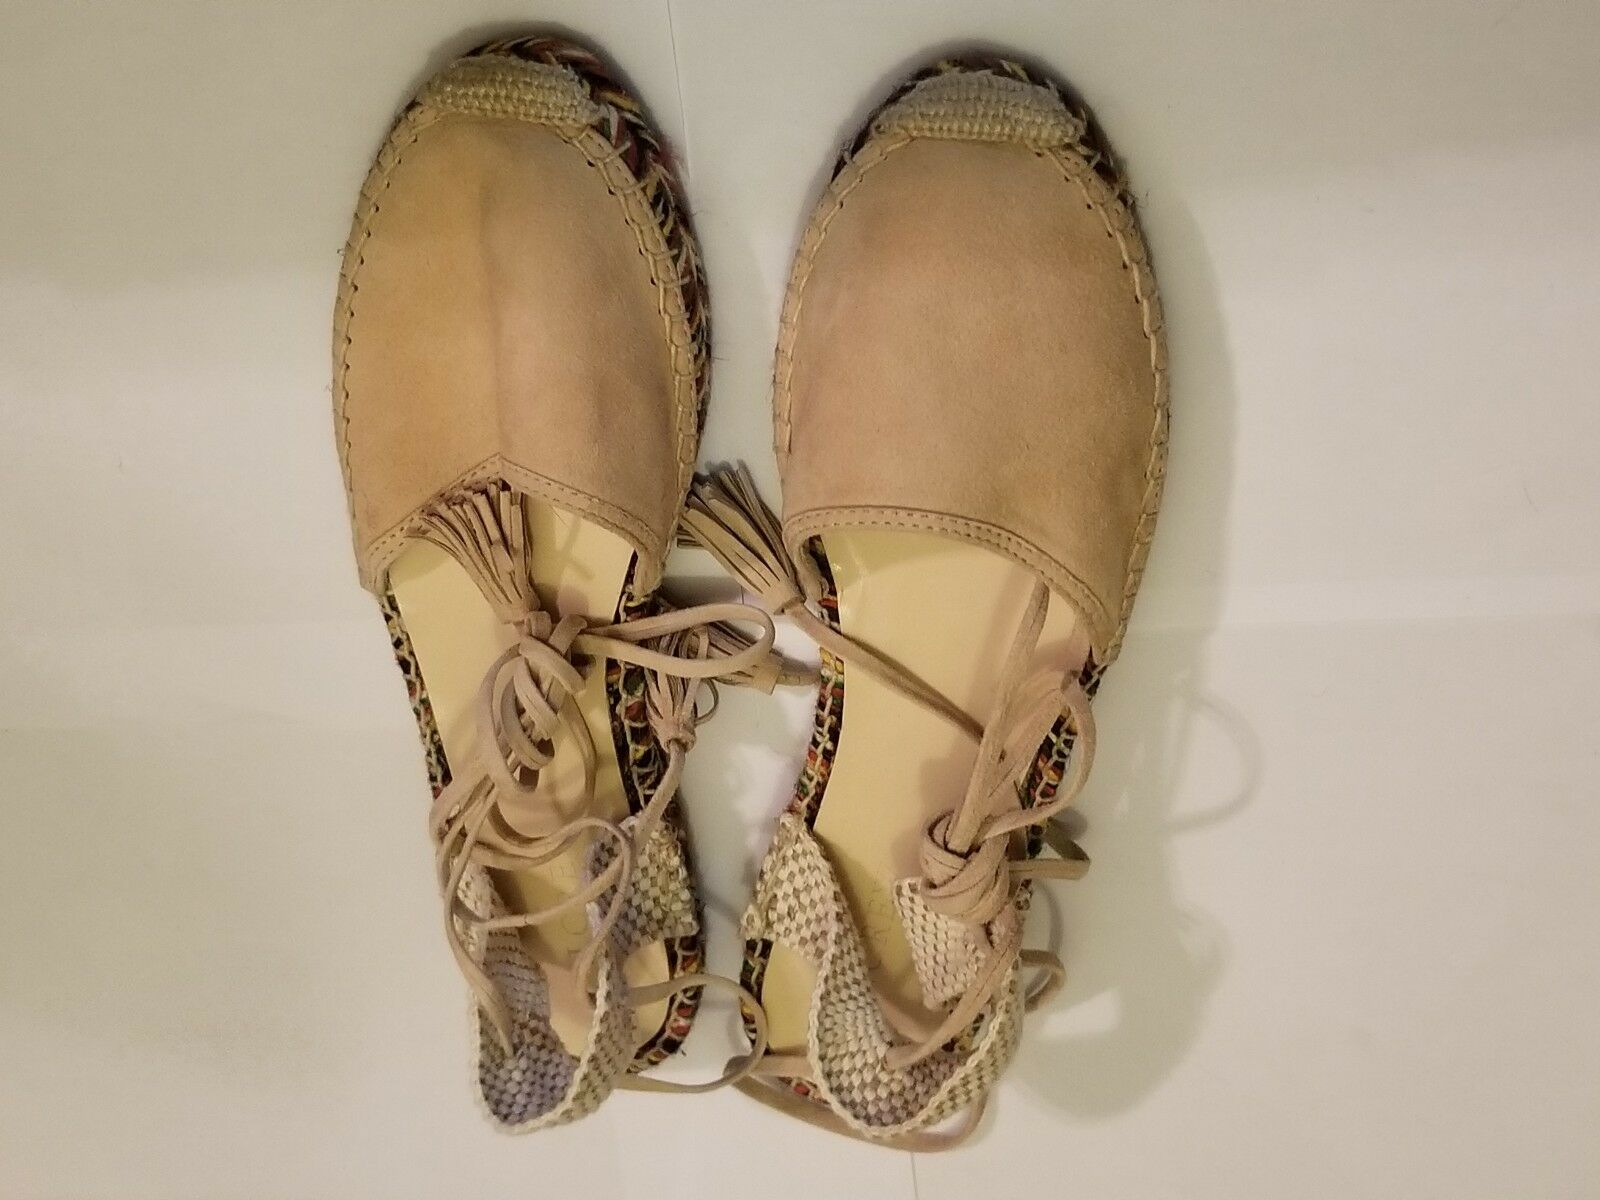 J.CREW NWT Baja LEATHER & Suede Espadrilles shoes Flats Size 10 desert canyon